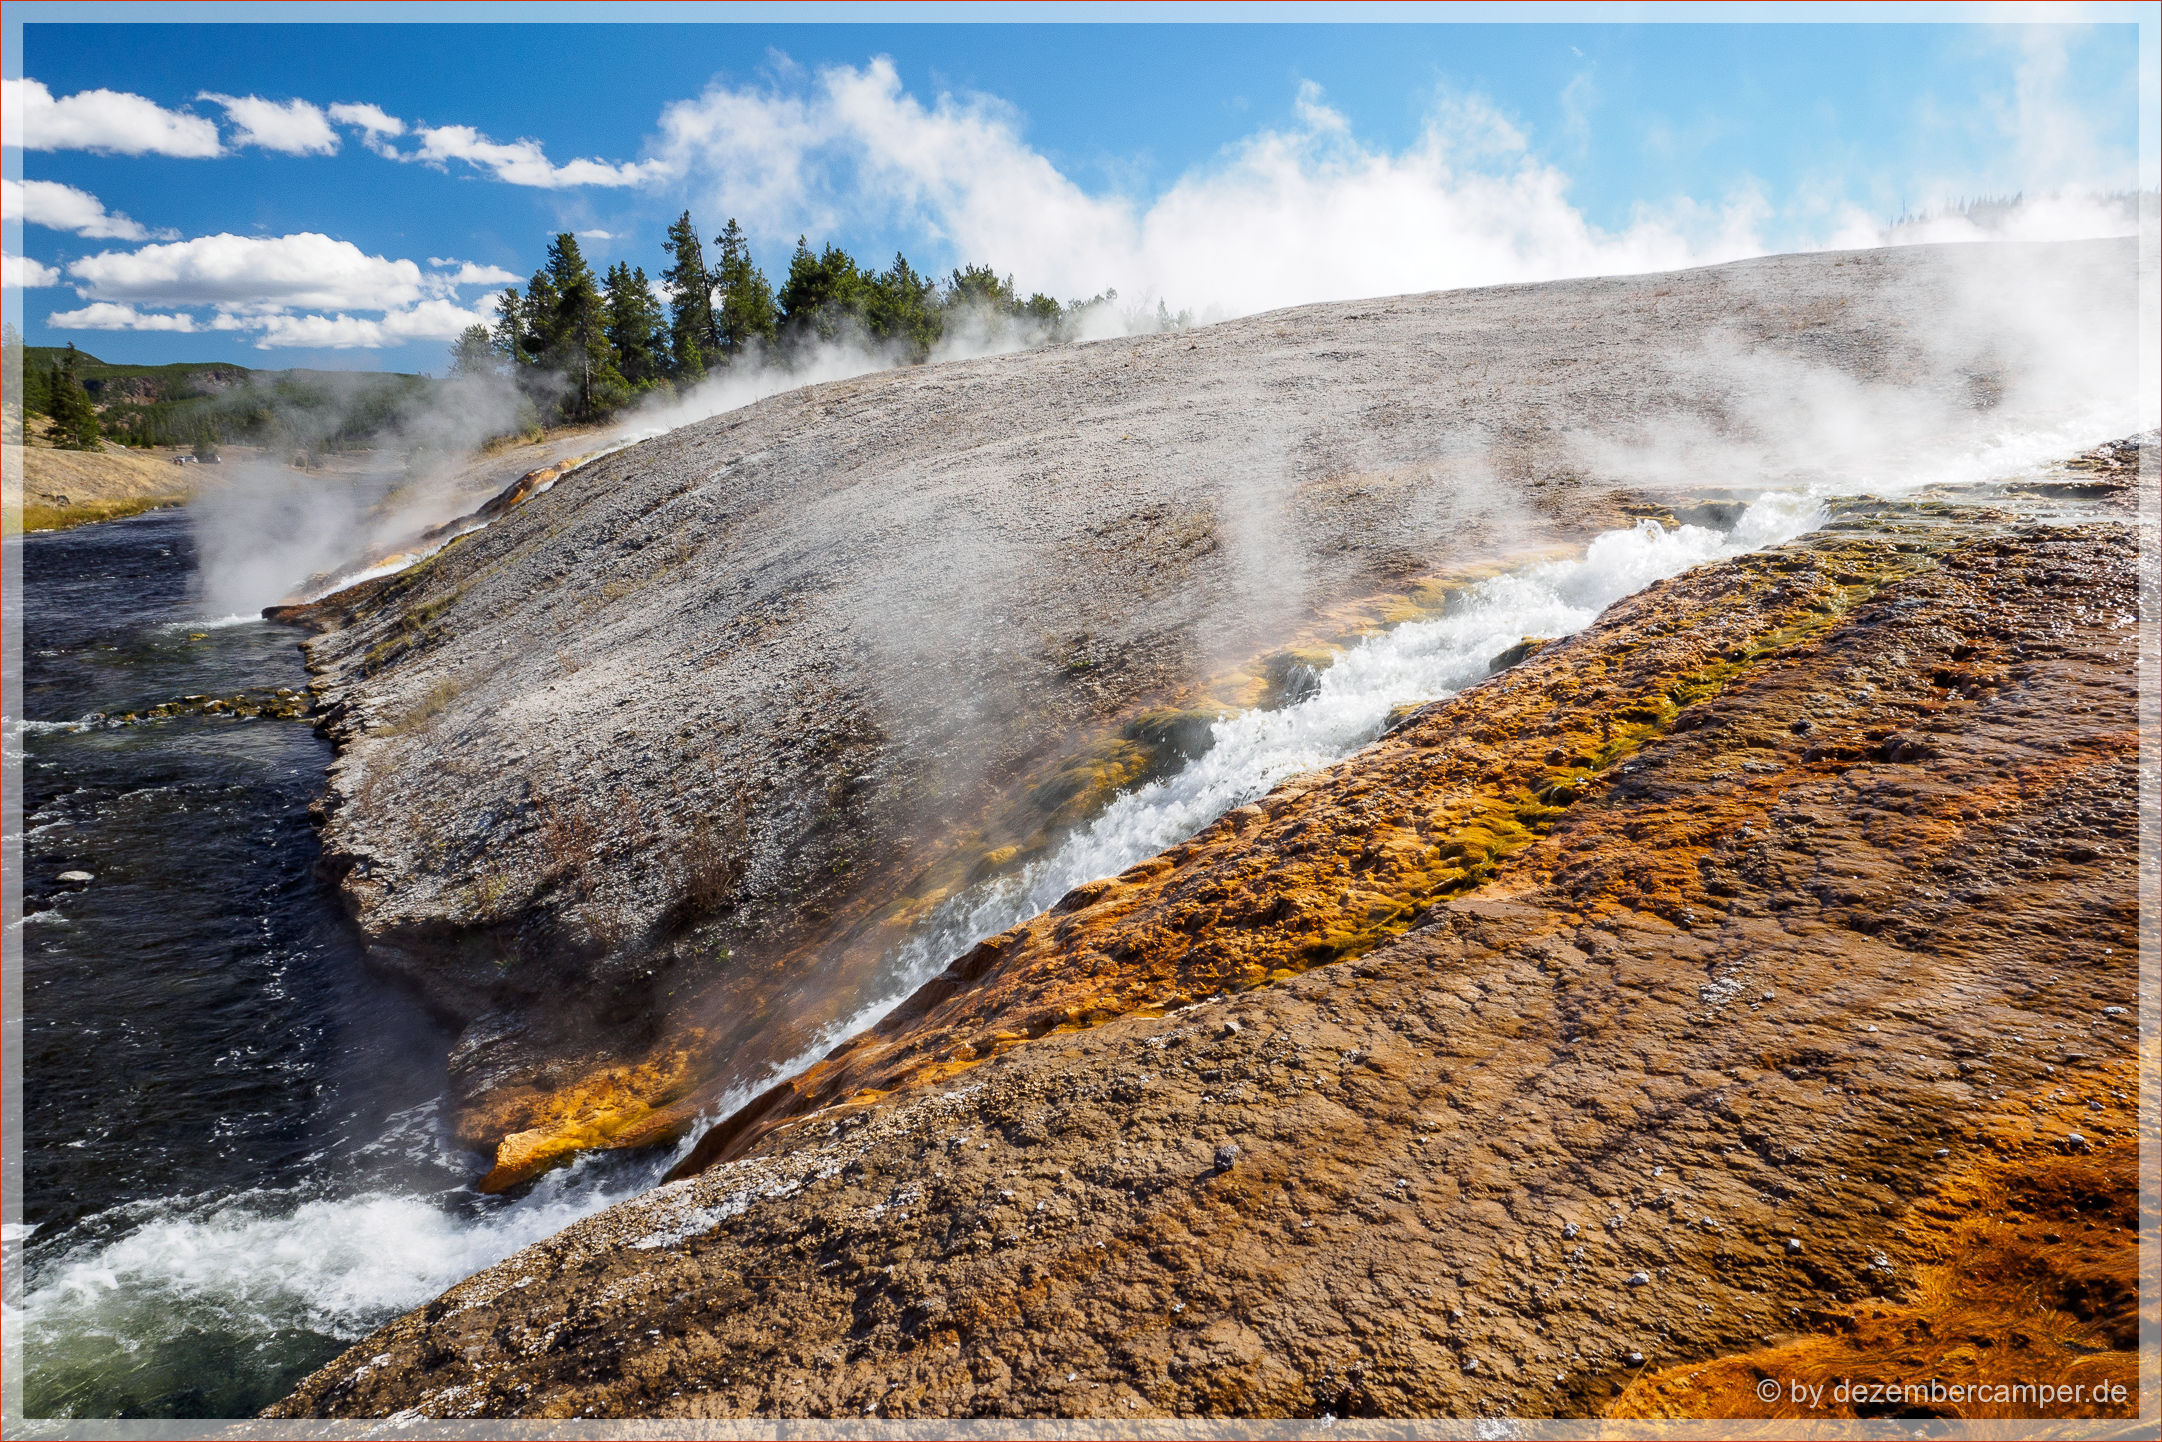 Yellowstone NP - Firehole River